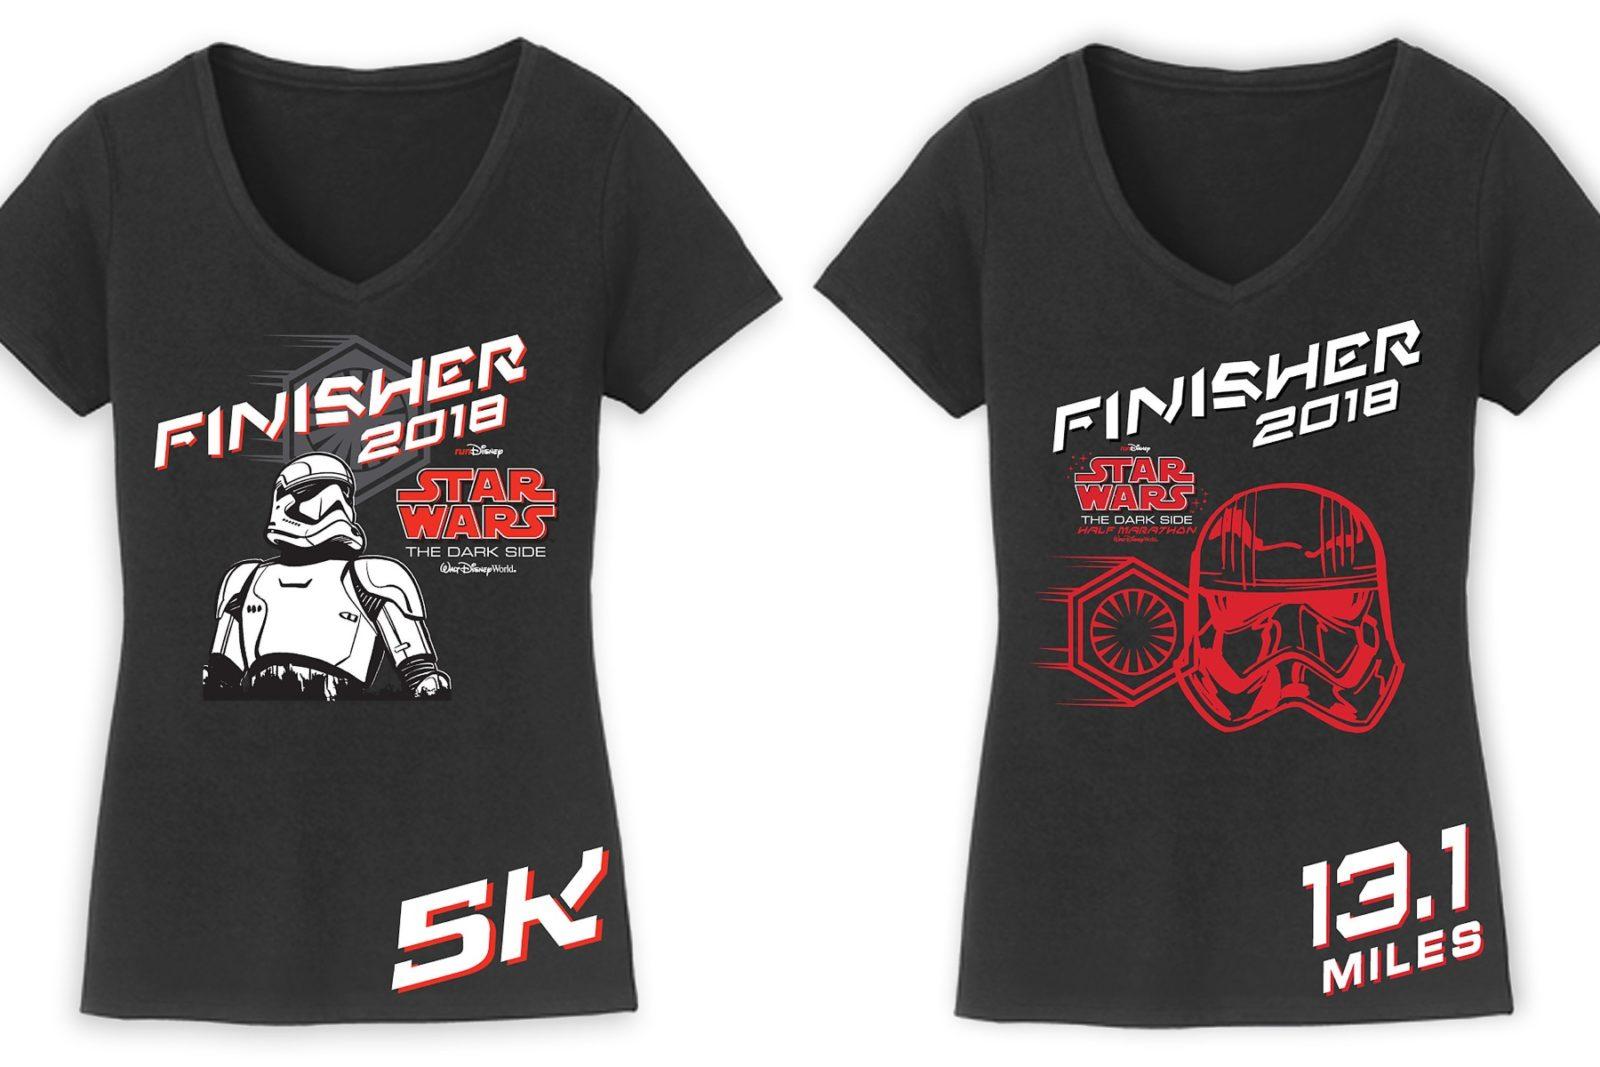 Run Disney Star Wars 2018 Finisher Apparel